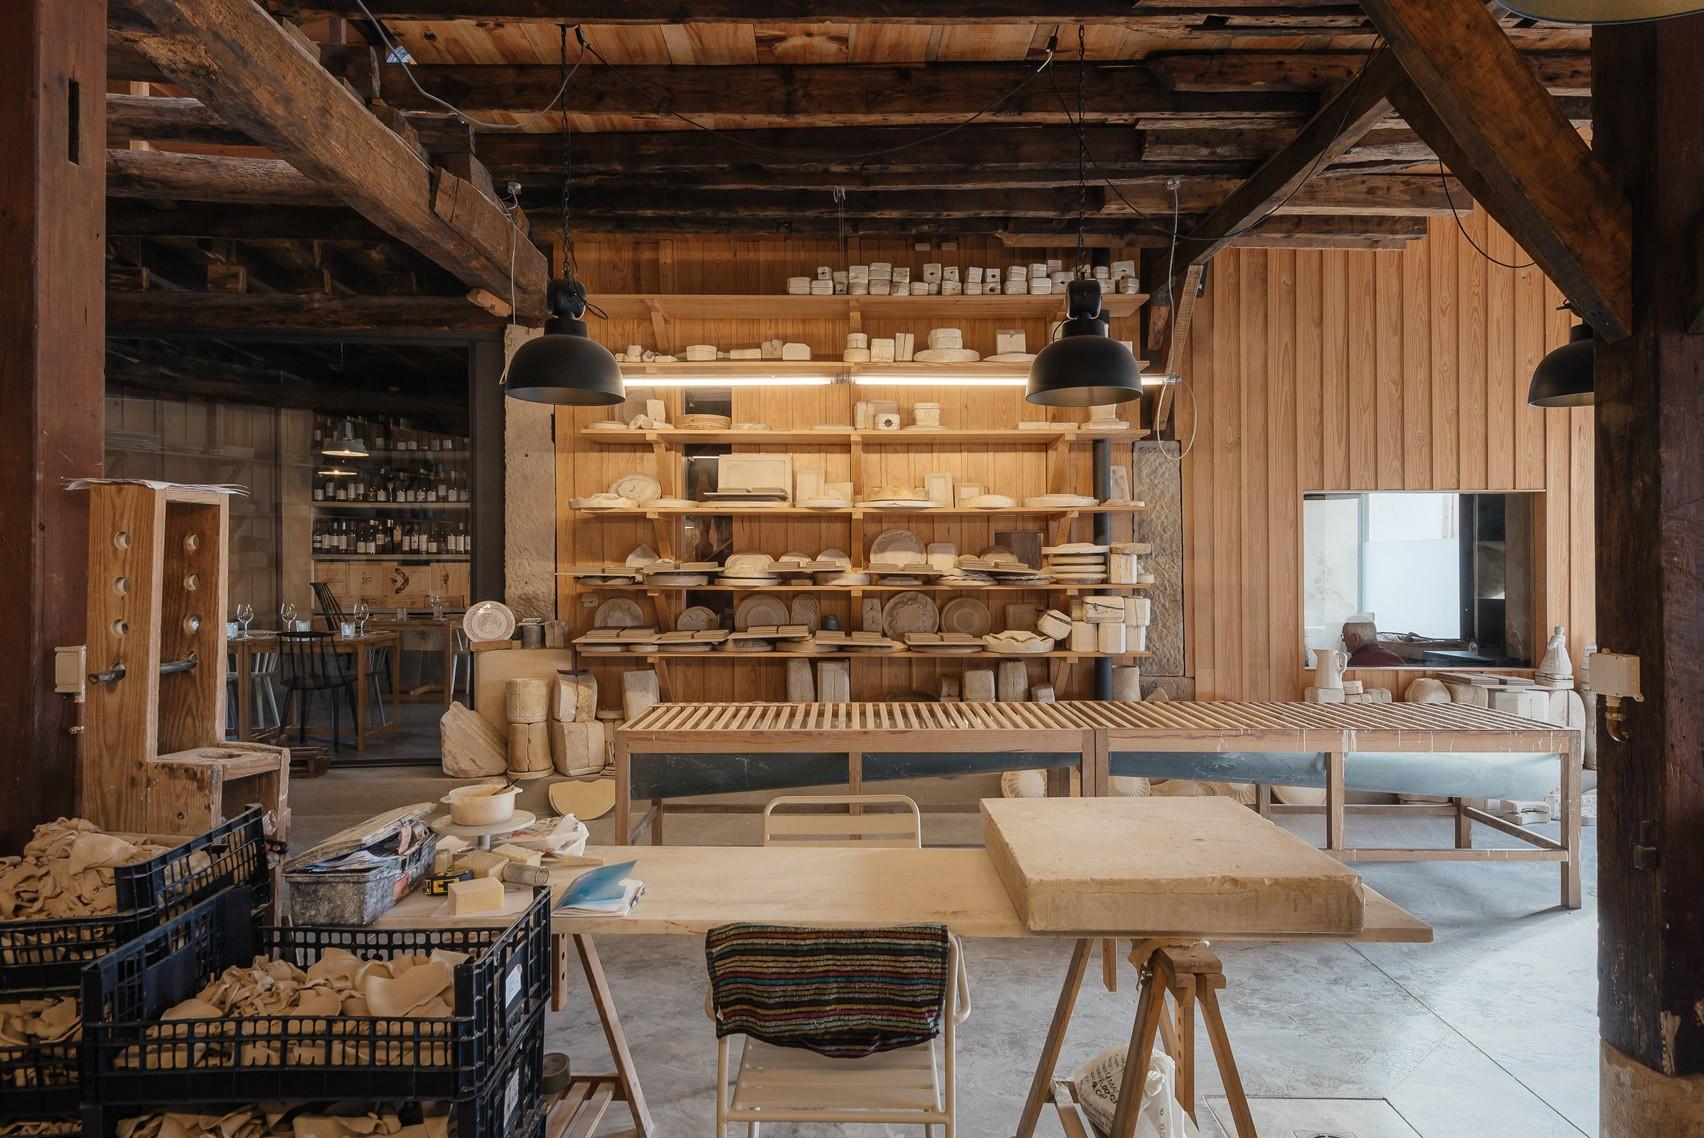 ceramic-factory-luisa-bebiano-atelier-do-corvo-interiors-portugal_dezeen_1704_col_12.jpg